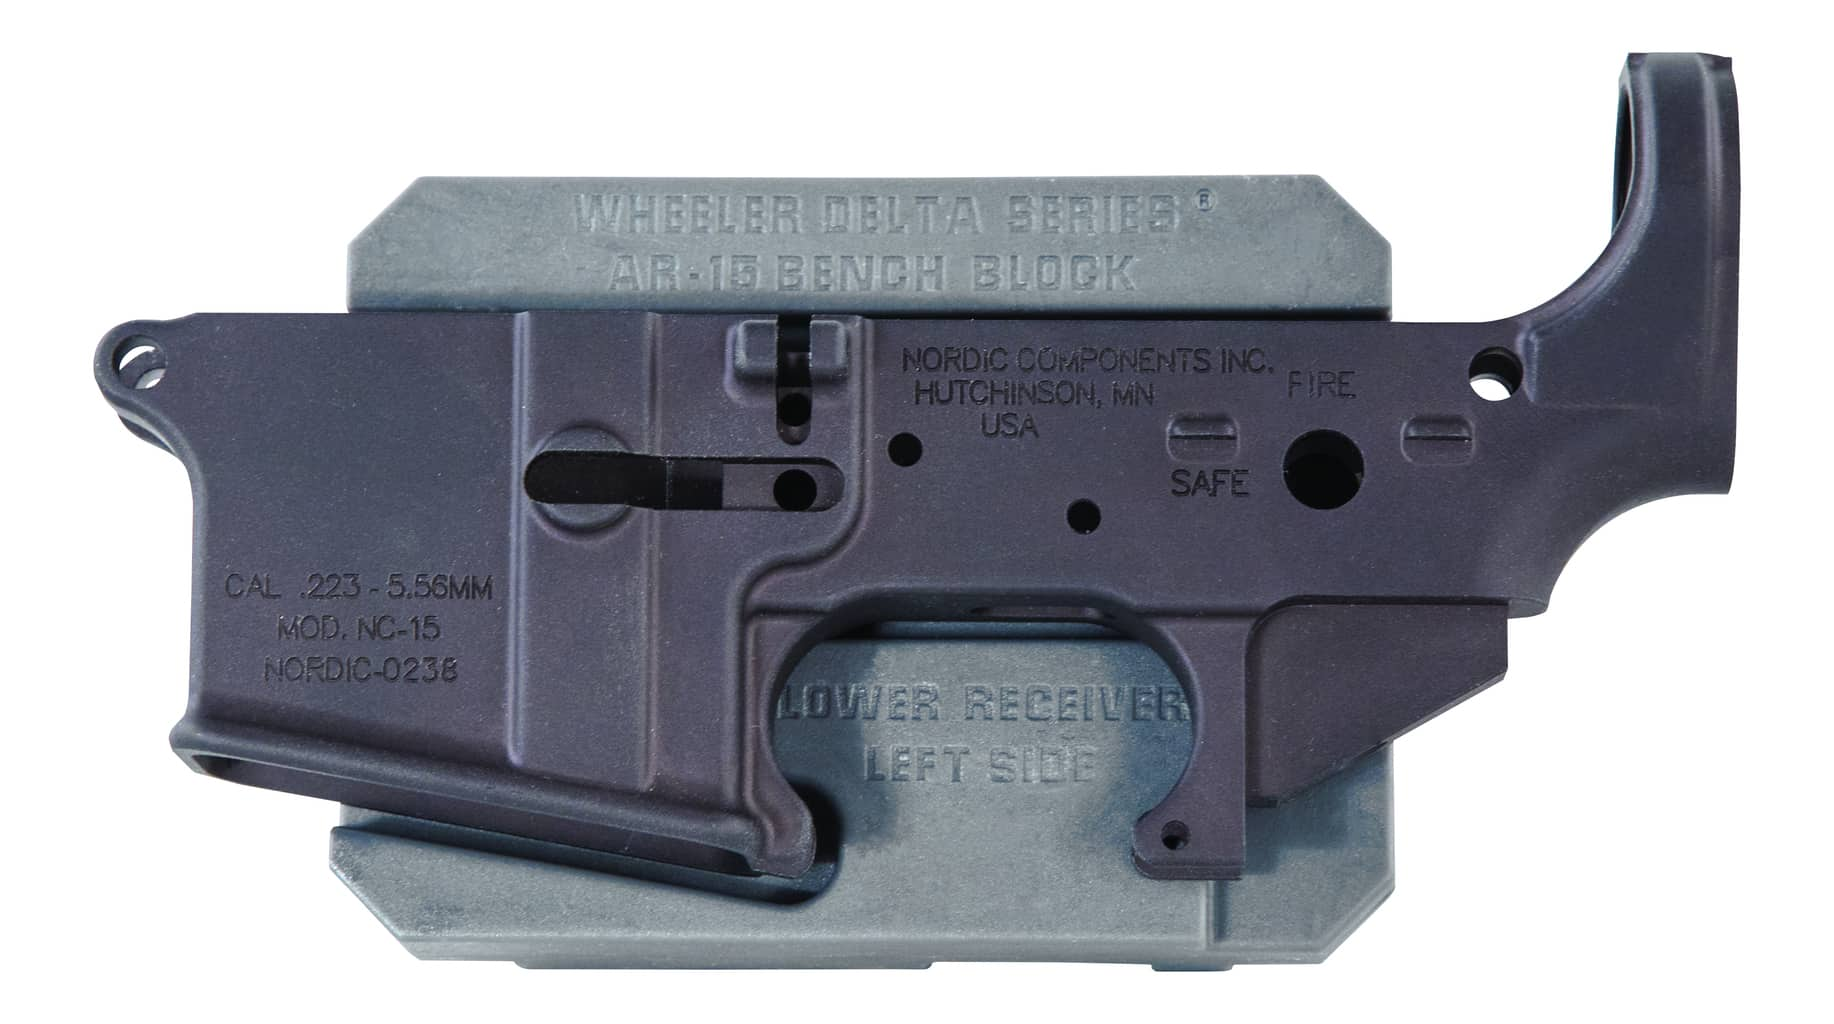 AR Armorer's Bench Block - 156945 Lower